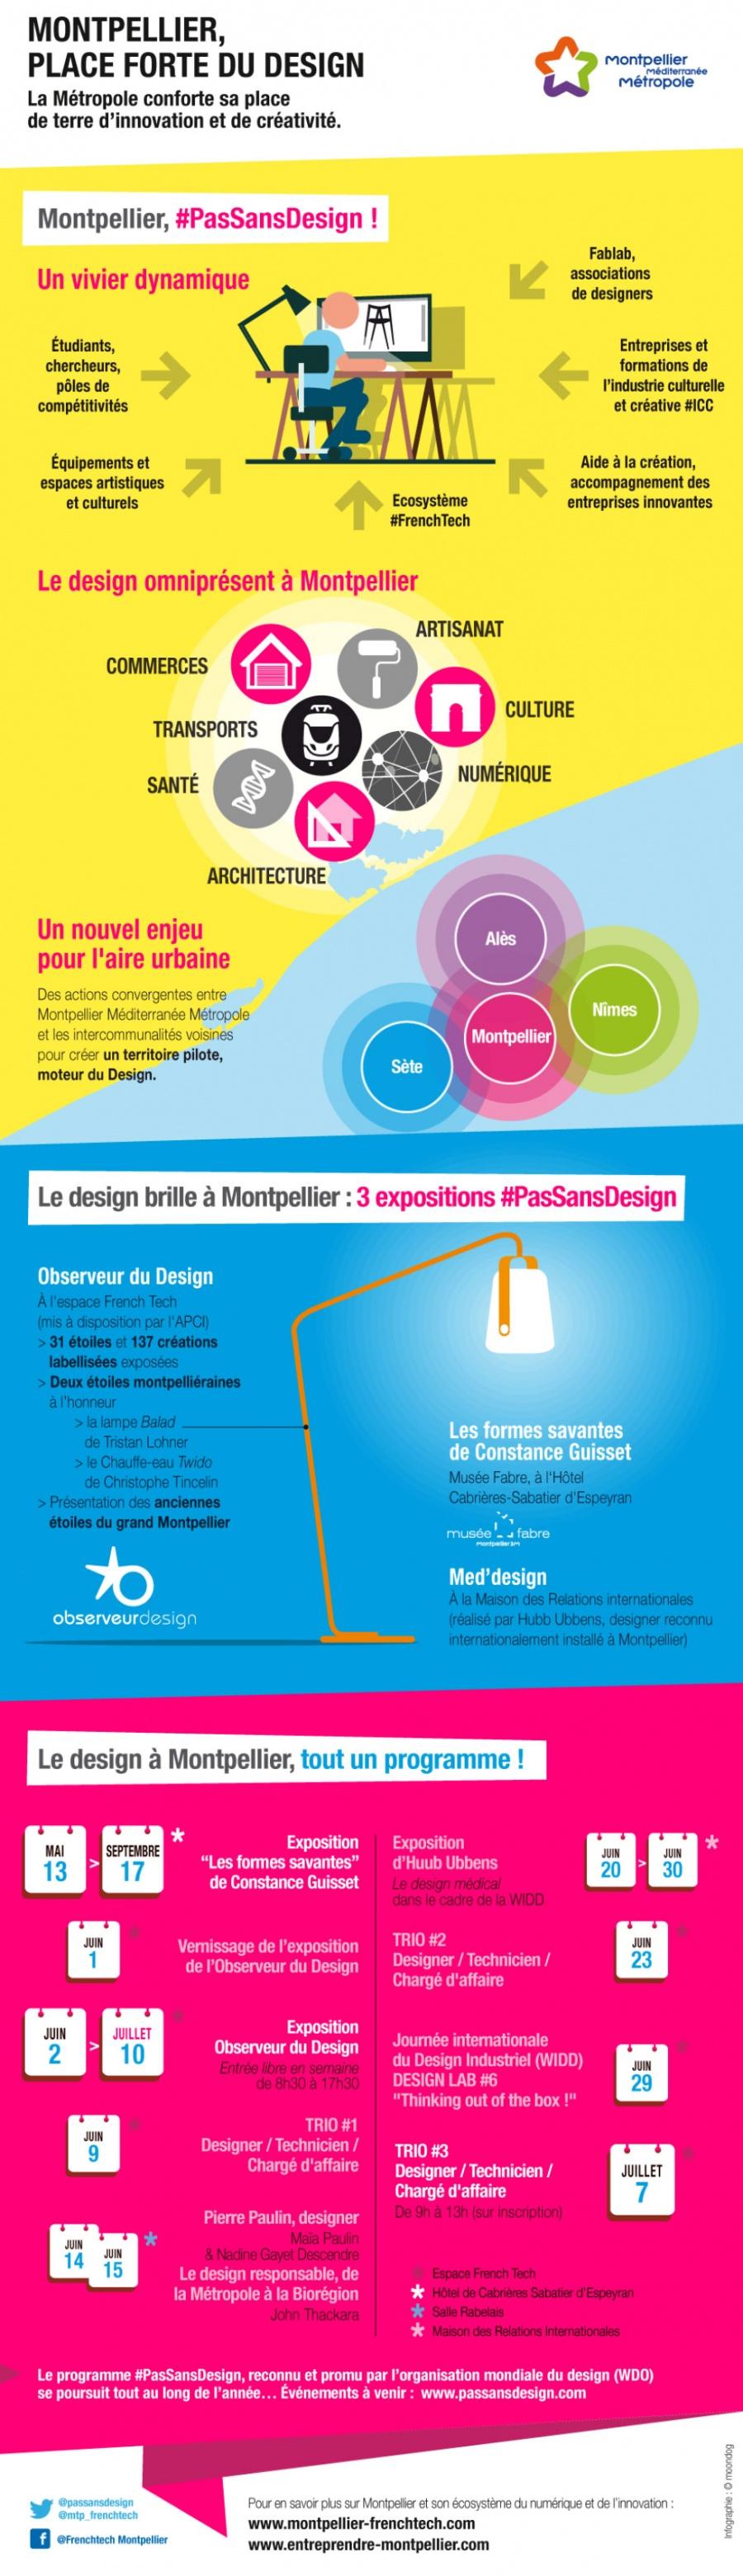 Montpellier, place forte du design